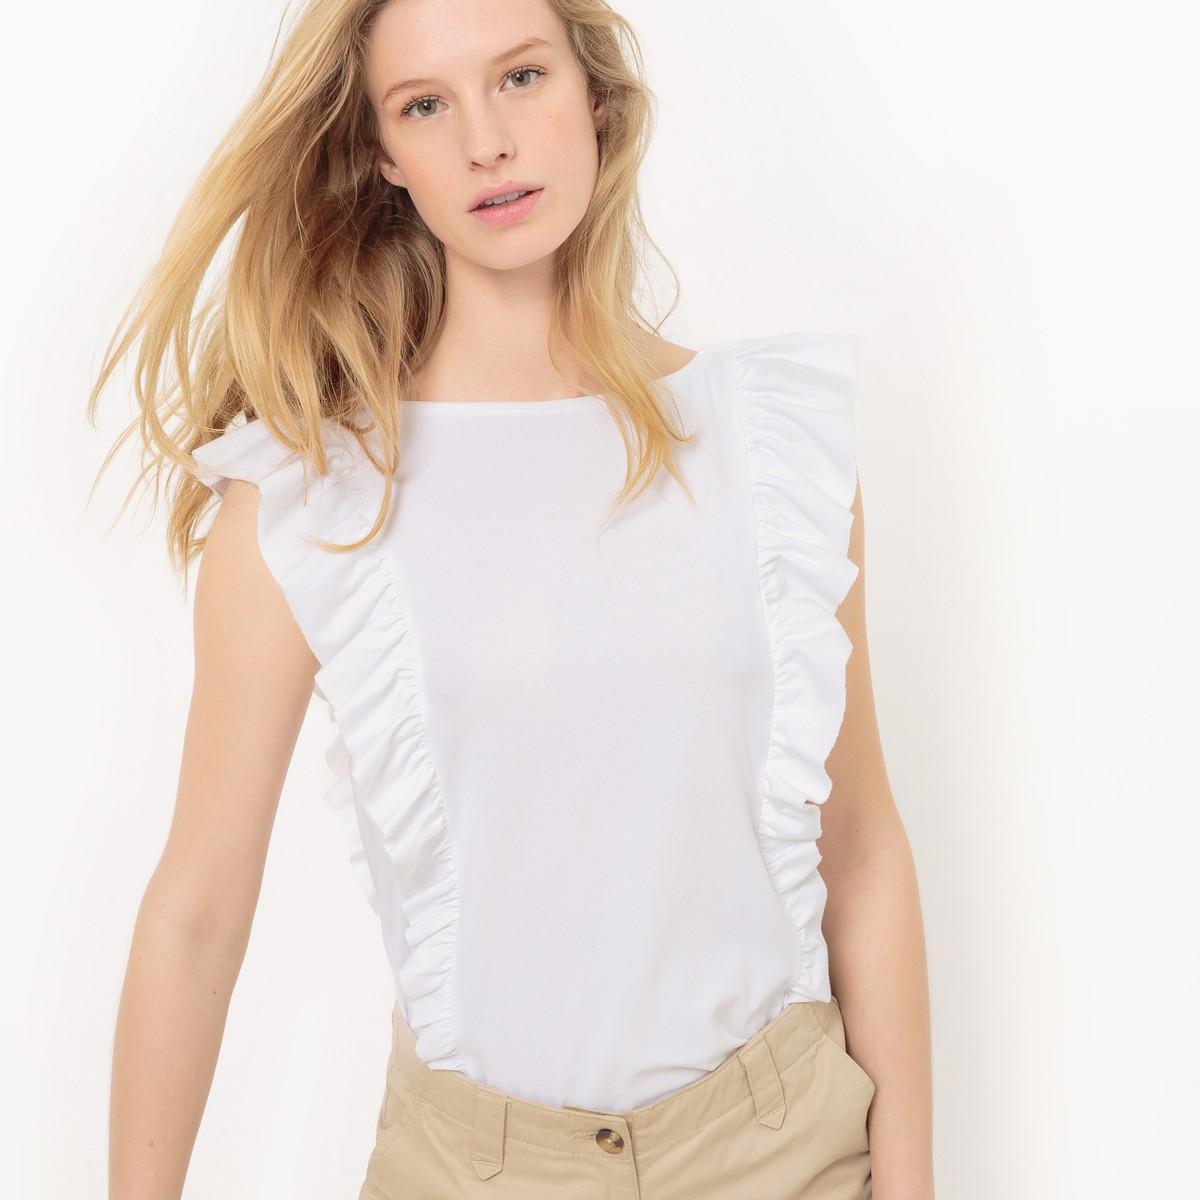 La redoute Tee Shirt Col Rond, Uni in White